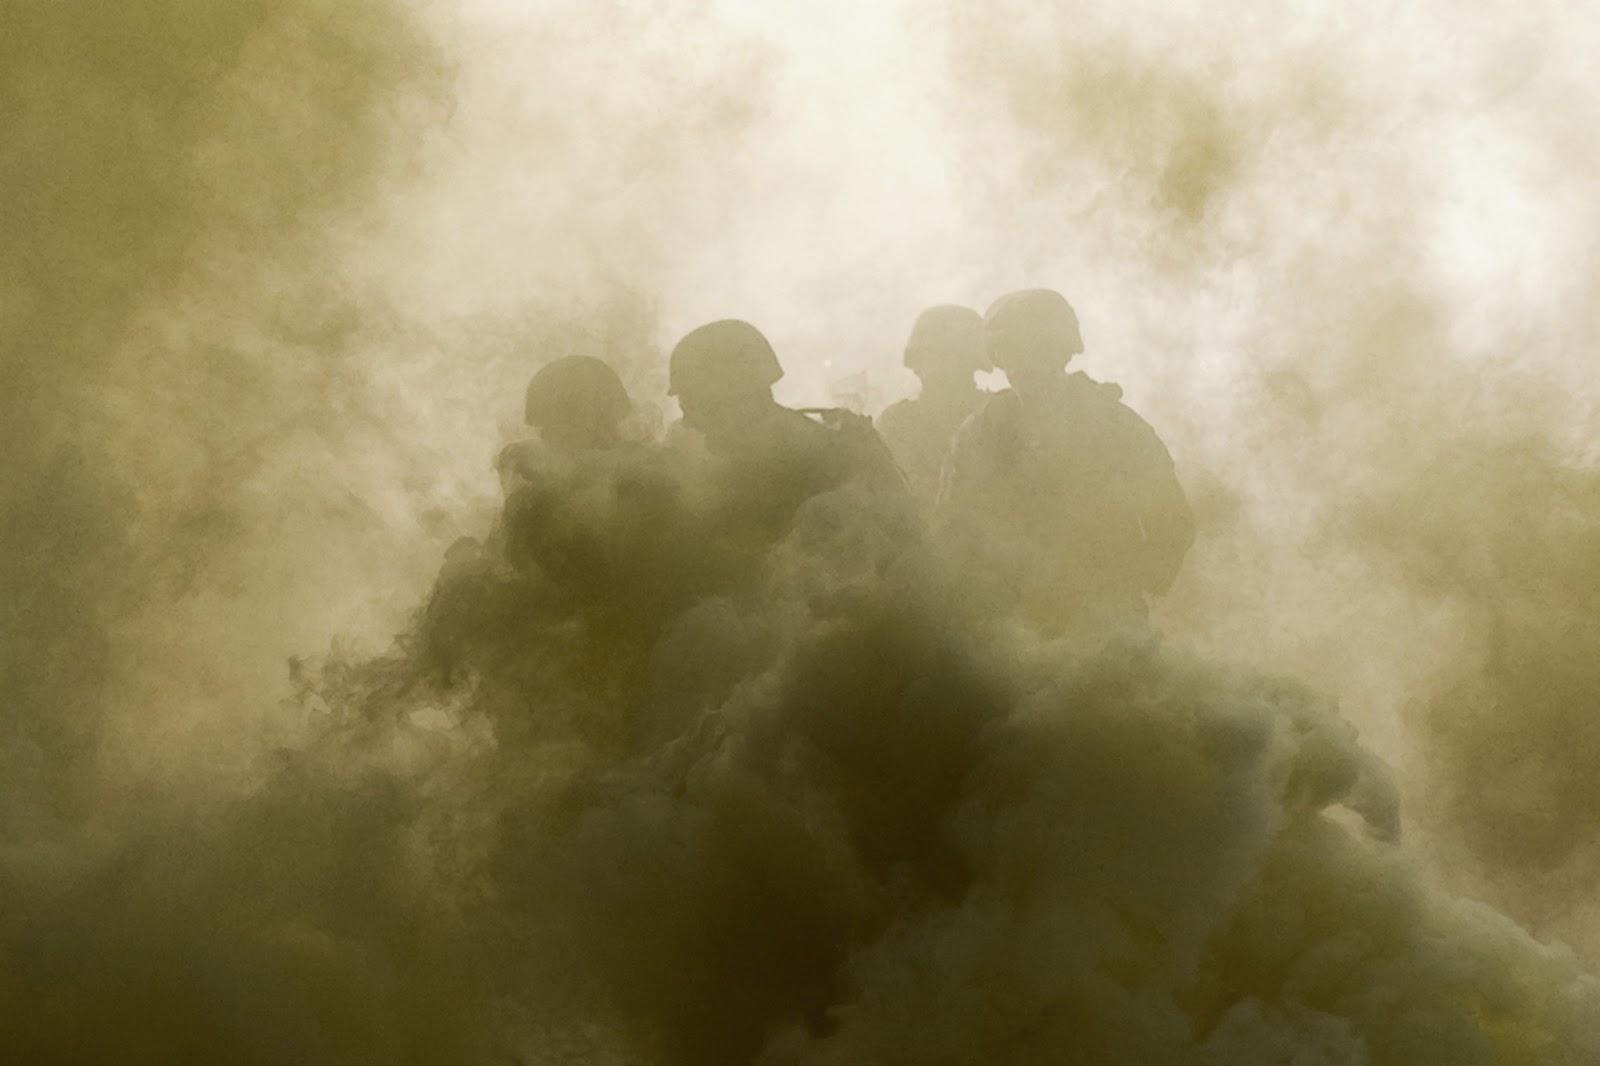 the fog of war 2 essay